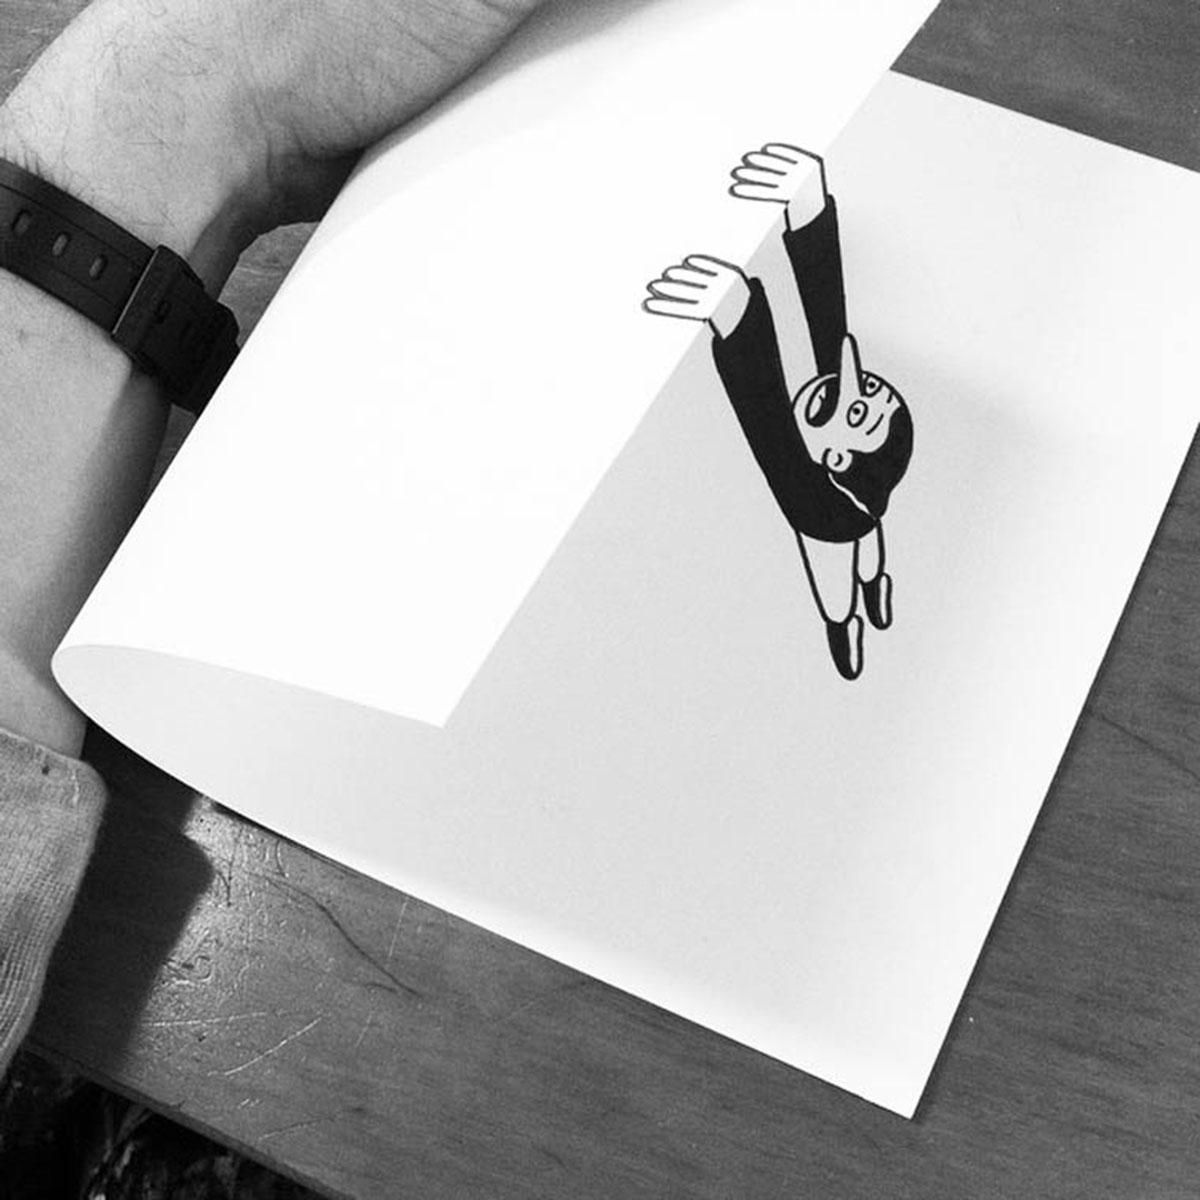 HuskMitNavn-illustration-11